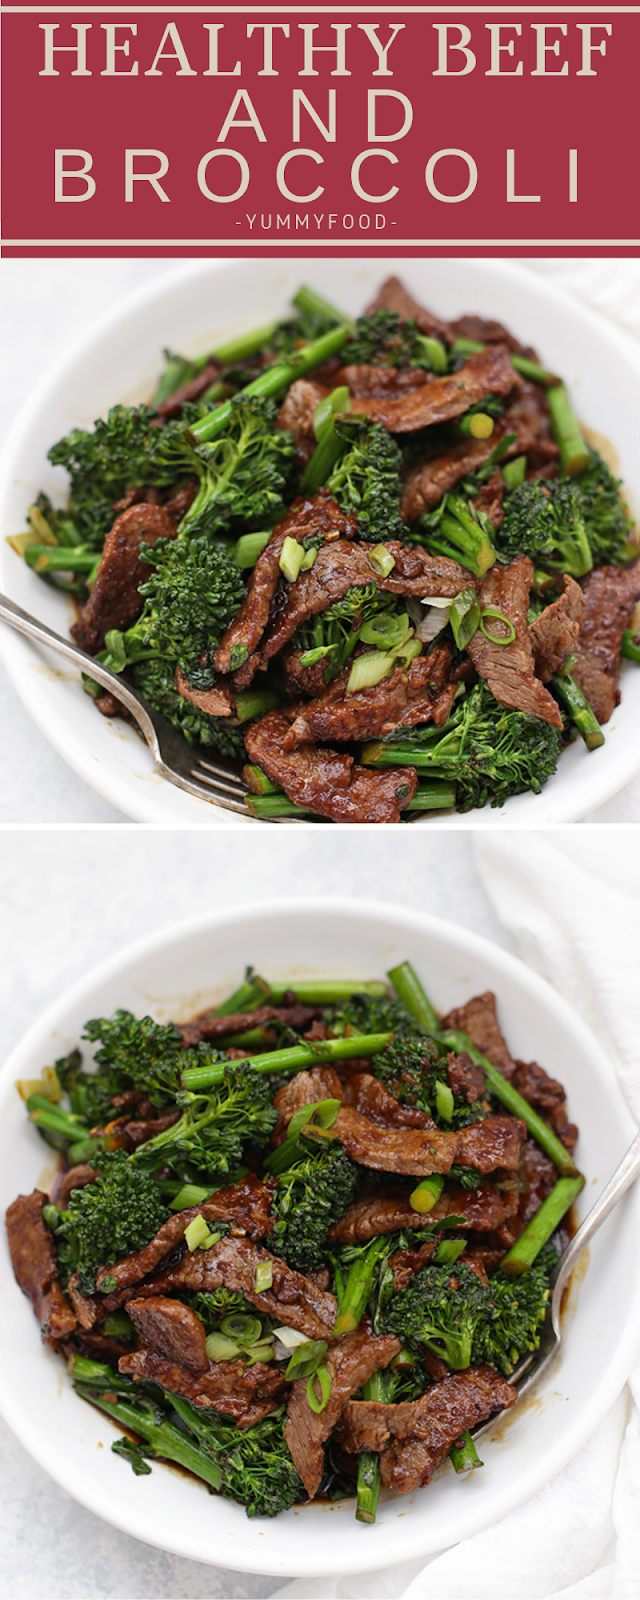 hеаlthу bееf аnd broccoli